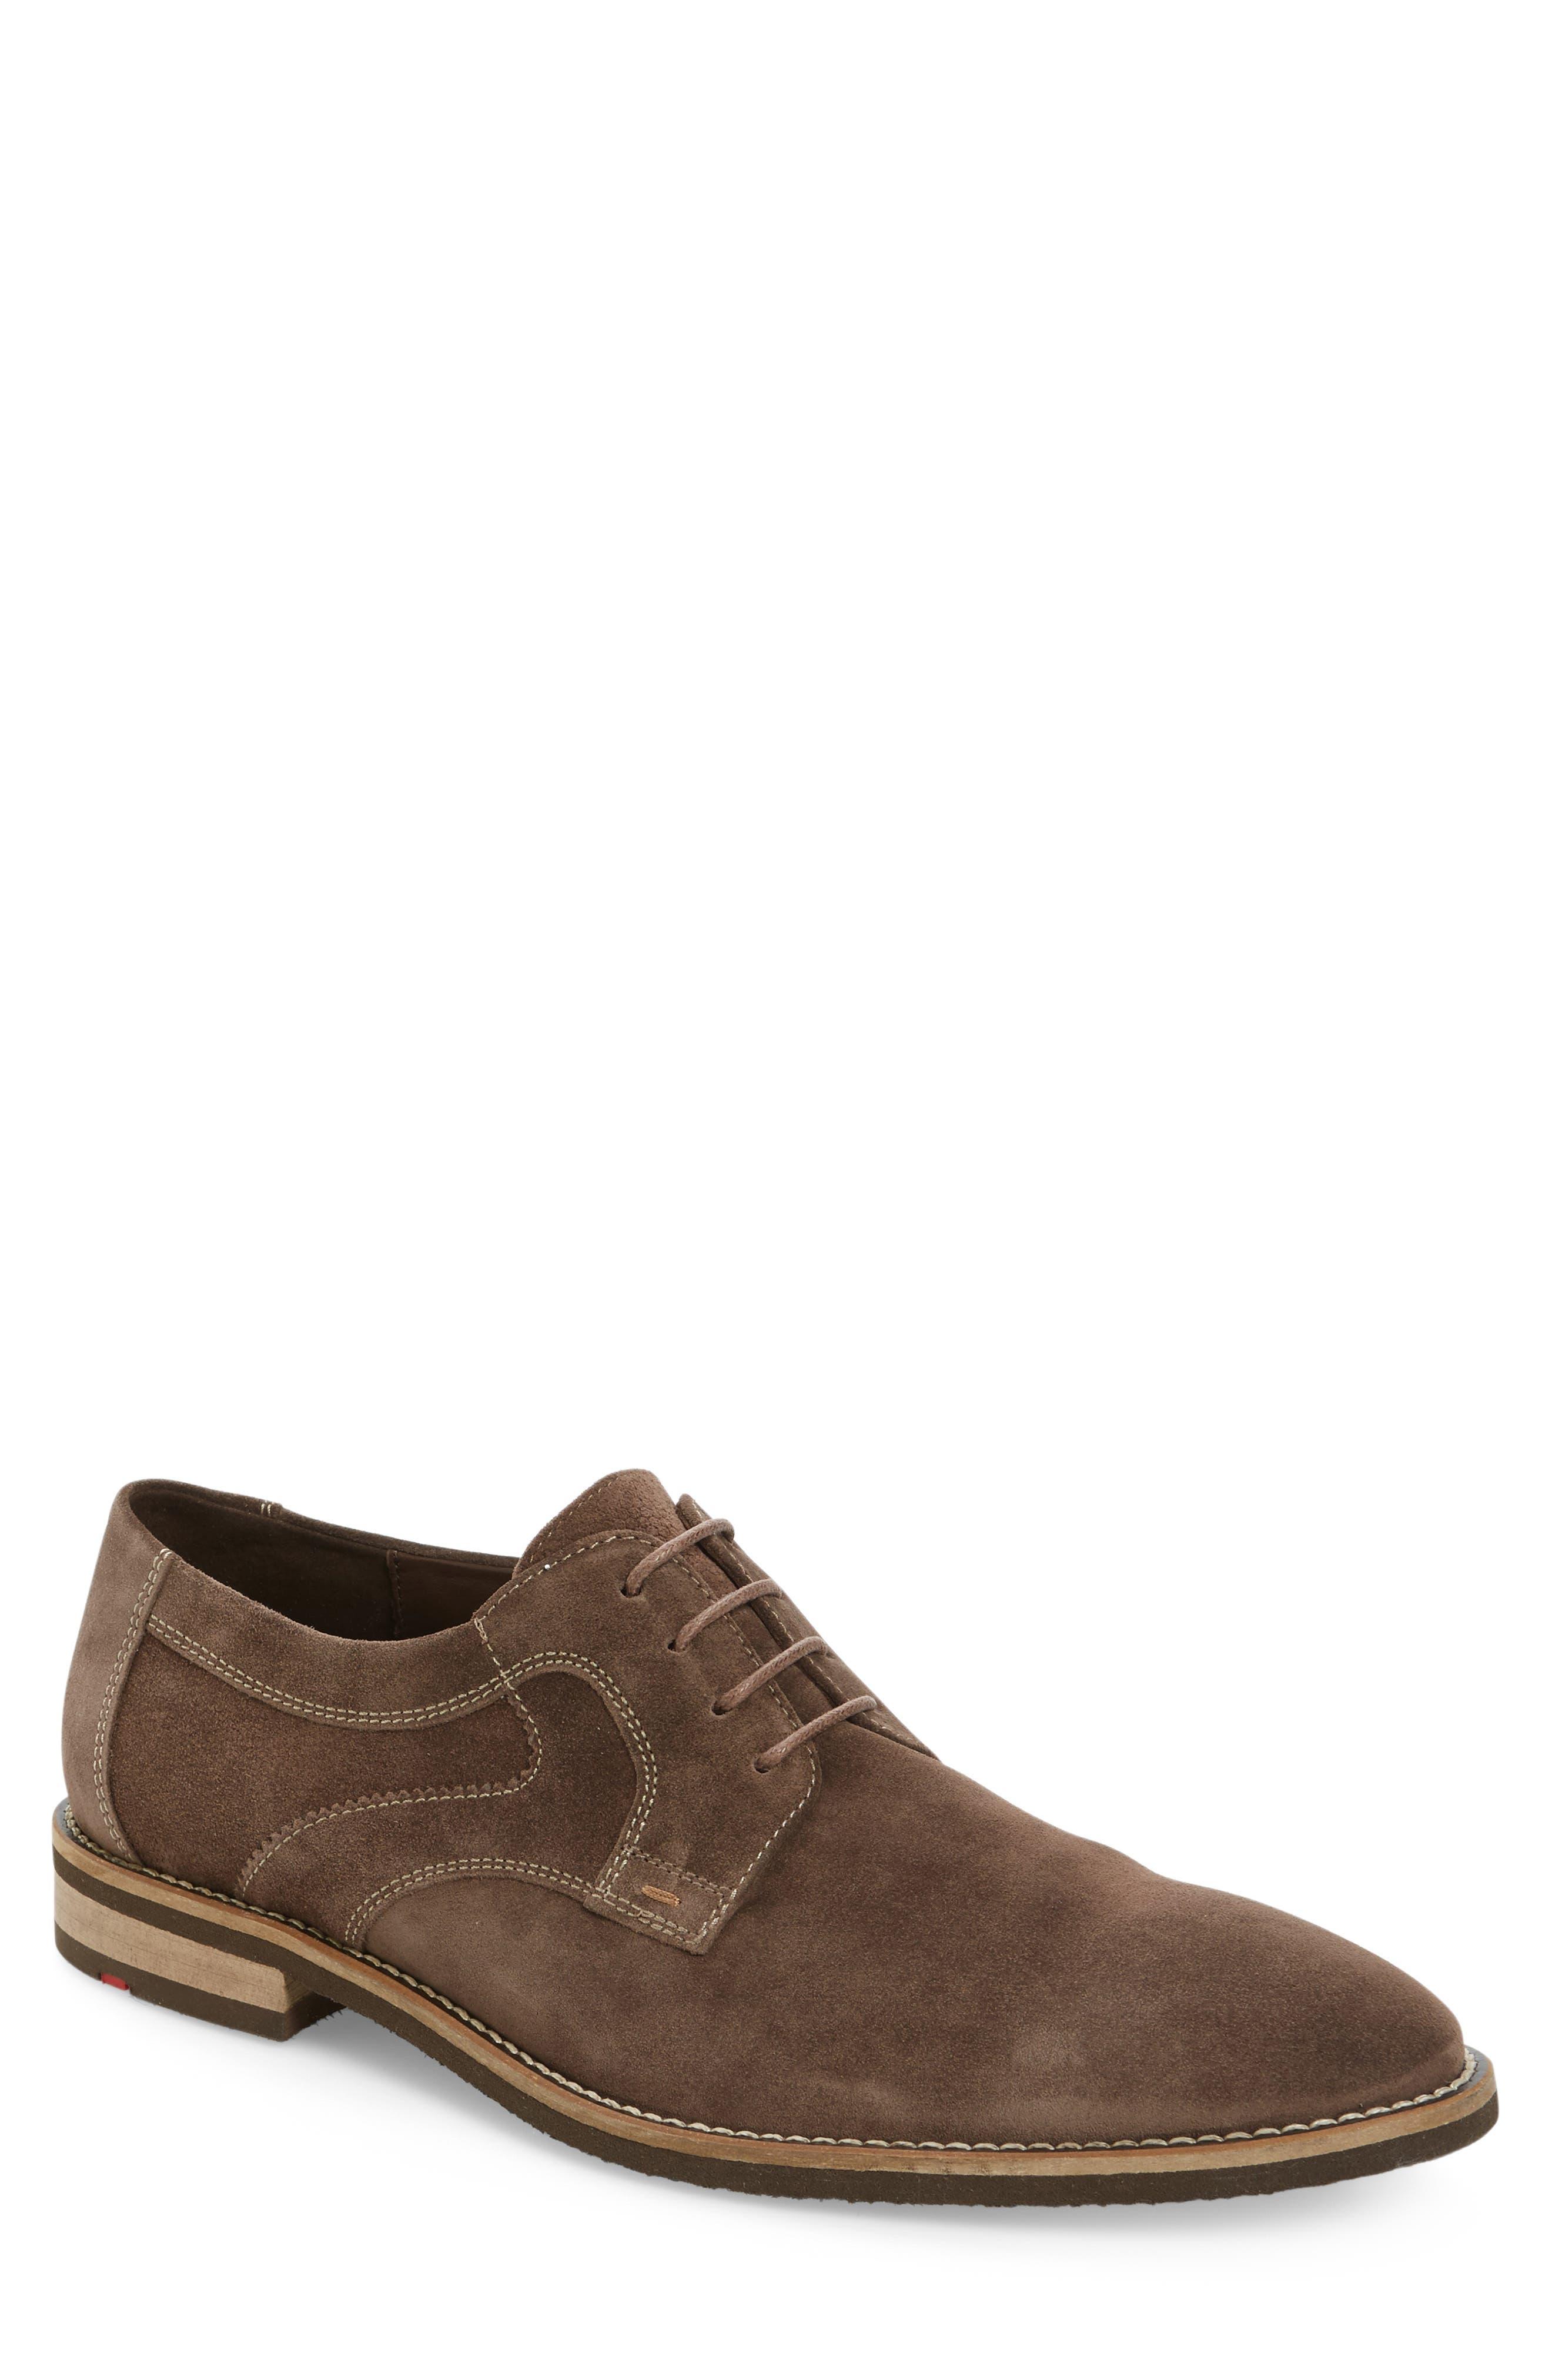 Haarlem Buck Shoe,                         Main,                         color, Noce Brown